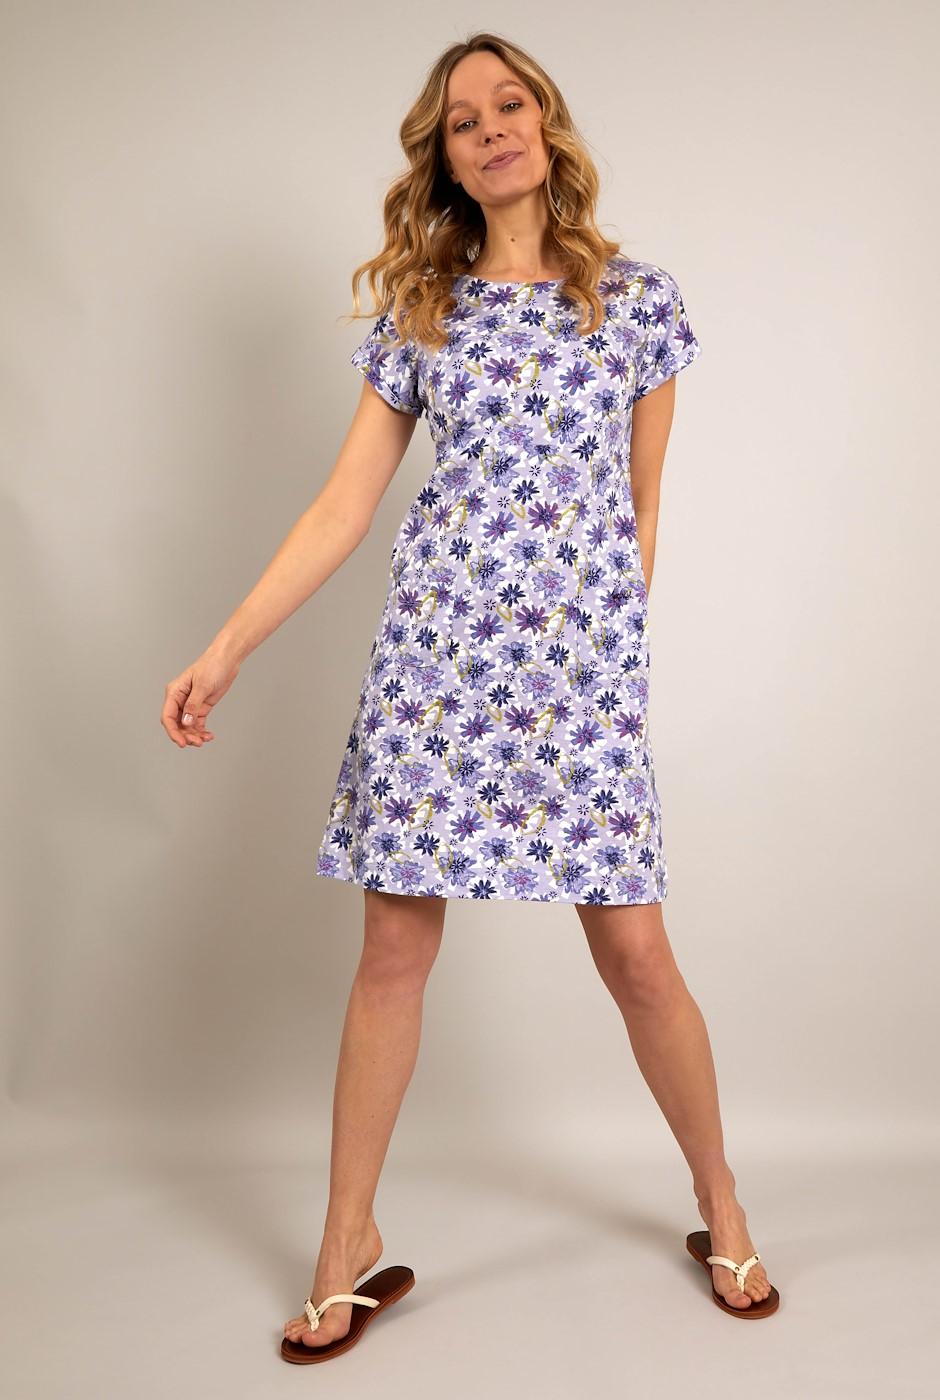 Tallahassee Organic Cotton Printed Jersey Dress Lilac Hint